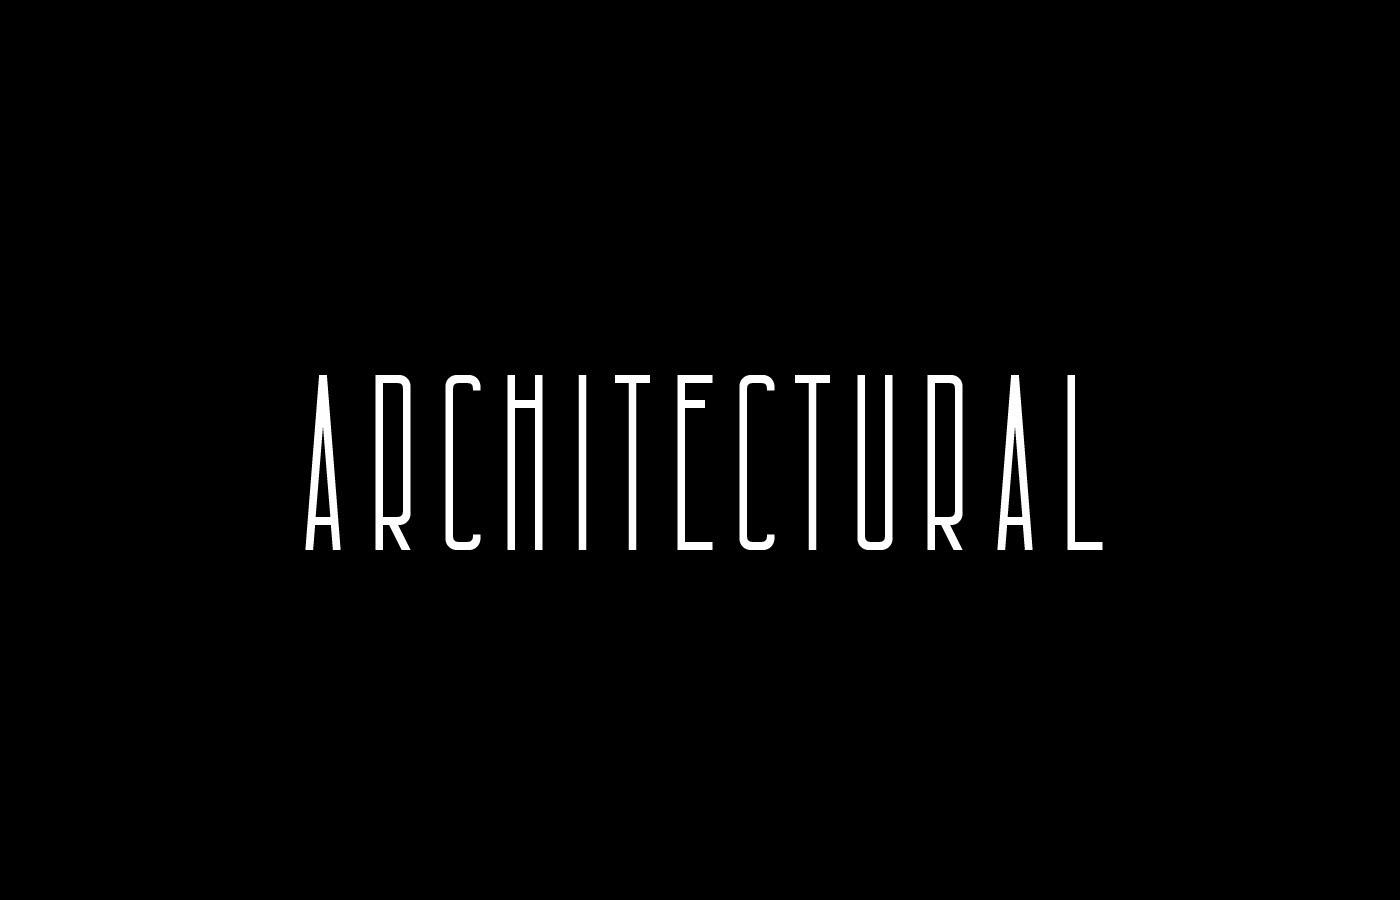 Architectural现代无衬线logo设计英文字体下载